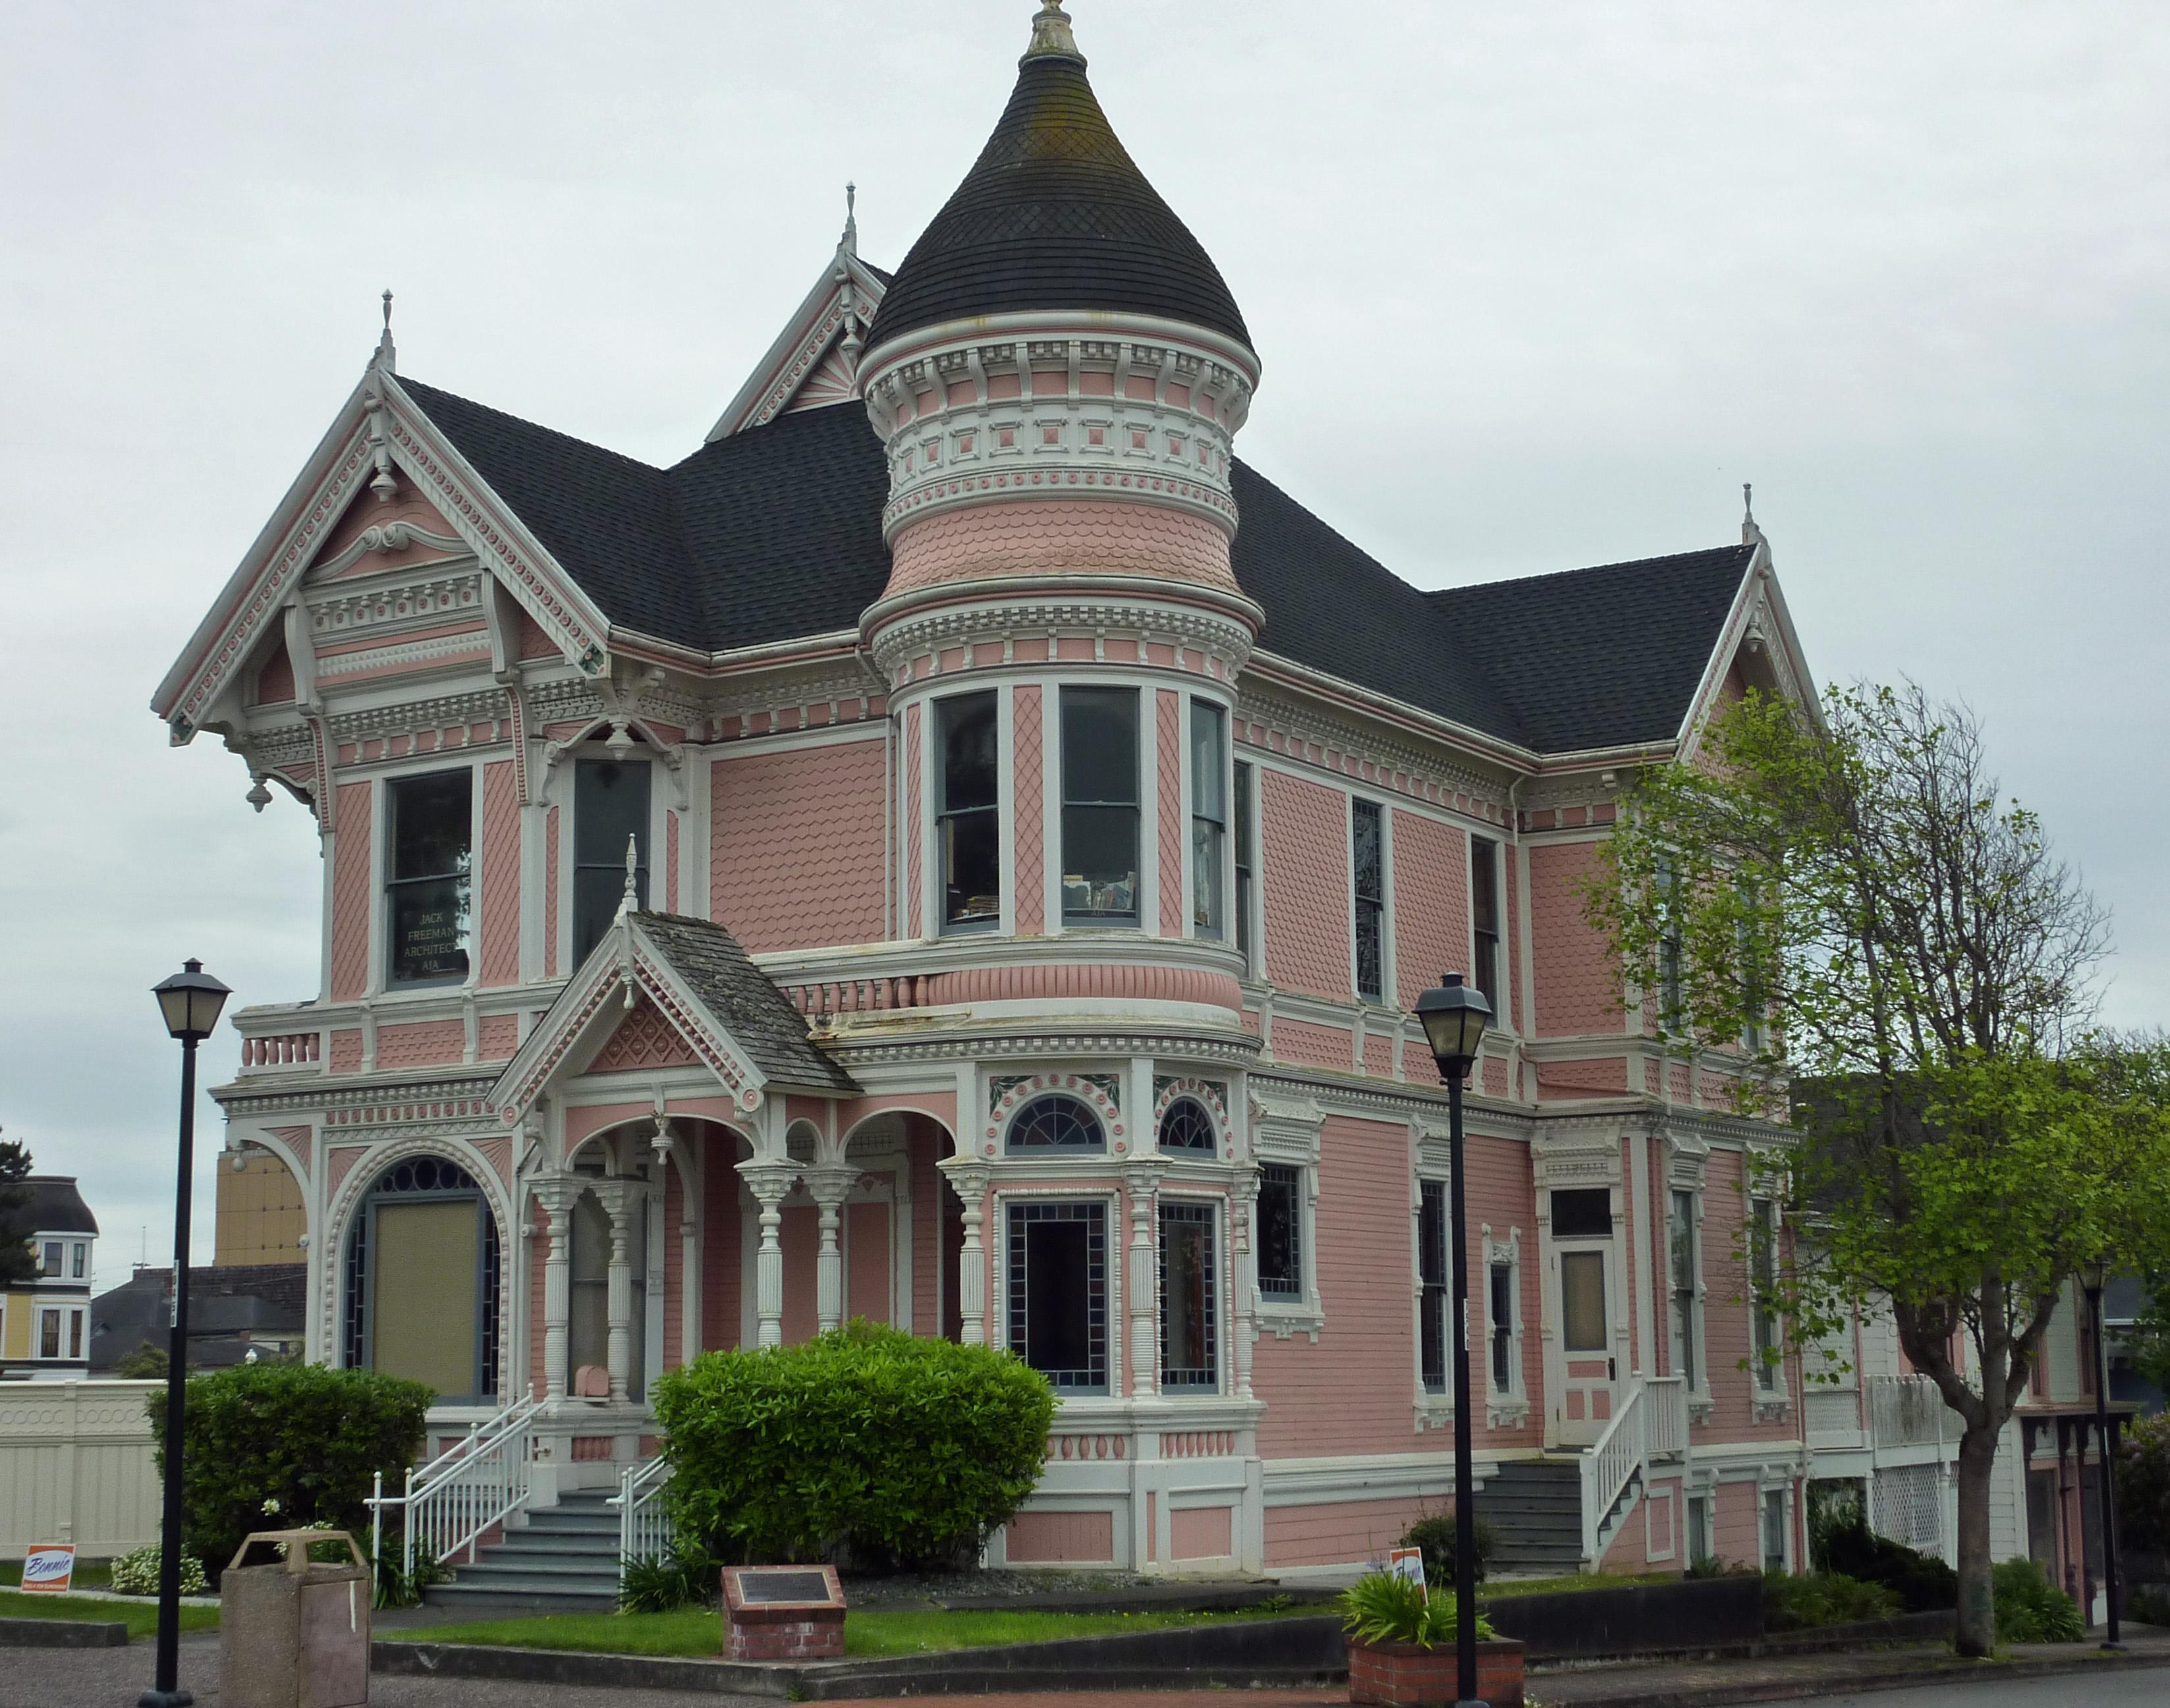 Victorian Houses - Lessons - Tes Teach